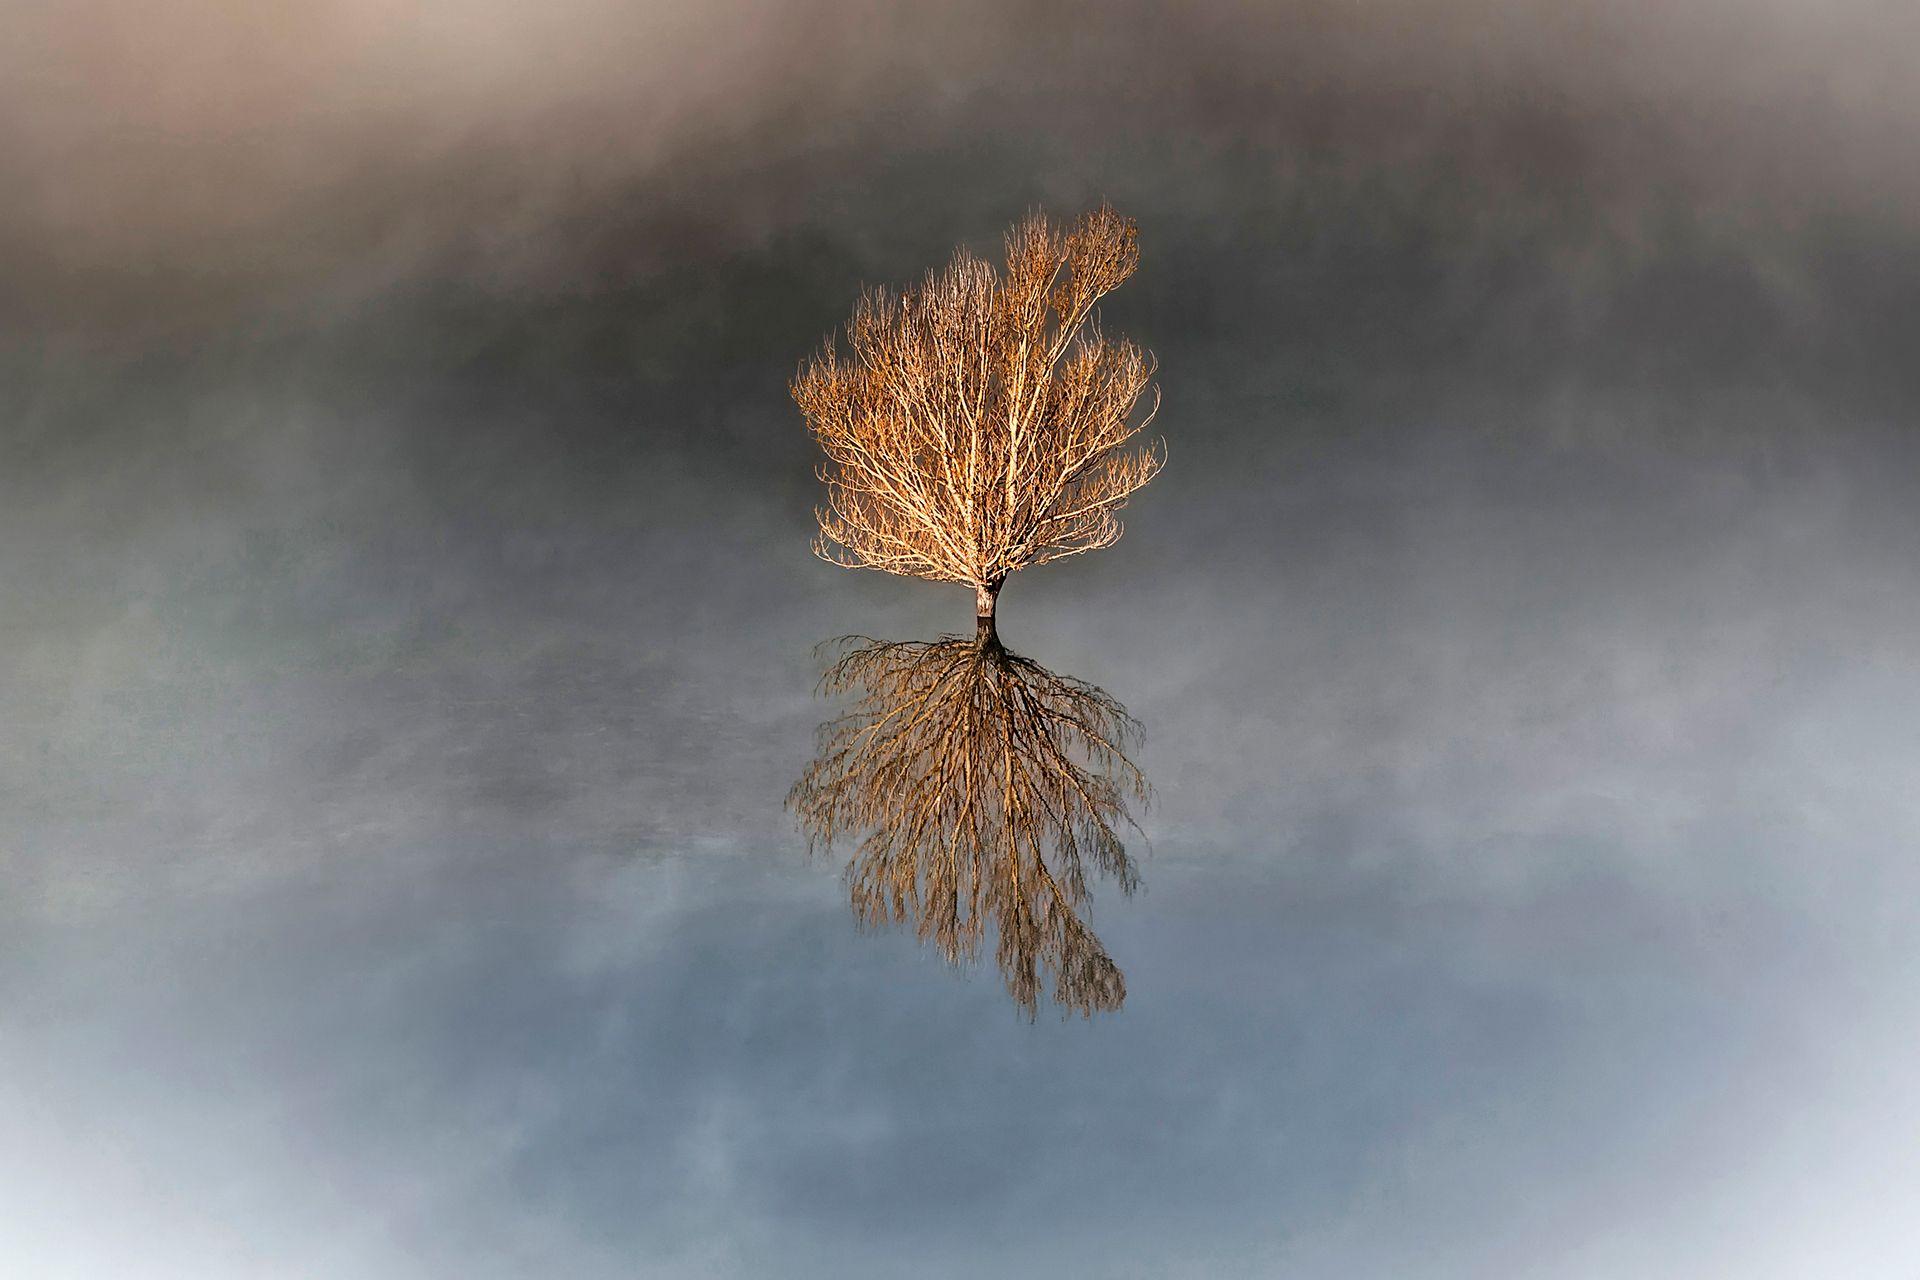 TREE FLOATING